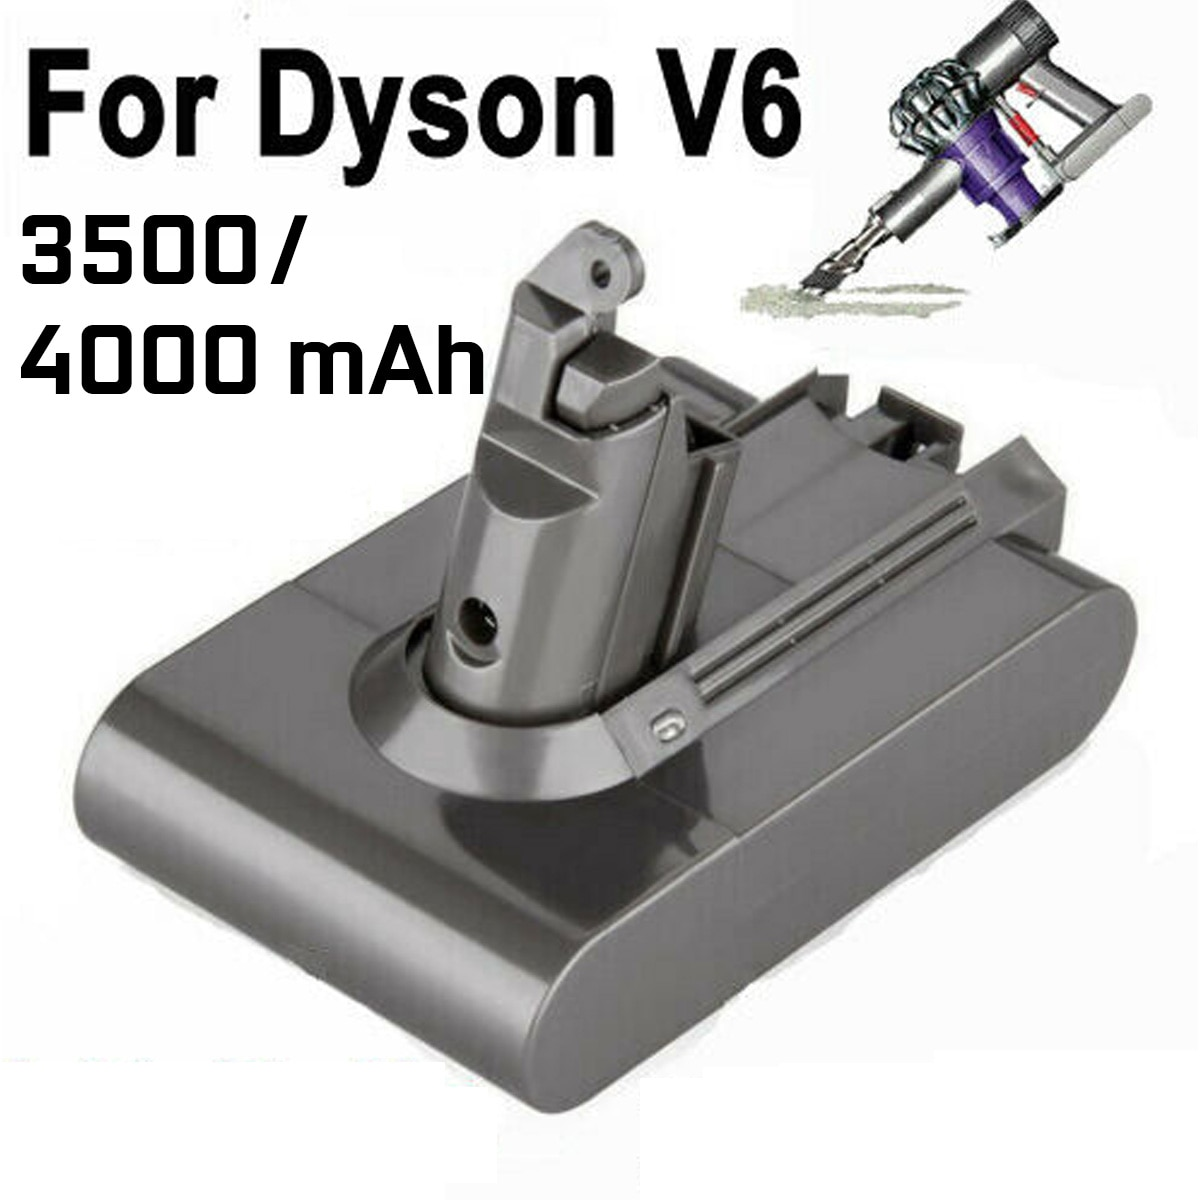 4000mAh 3500mAh Li-ion Vacuum Cleaner Battery for Dyson Battery V6 DC58 59 61 62 72 74 Vacuum Cleaner Replacement Battery